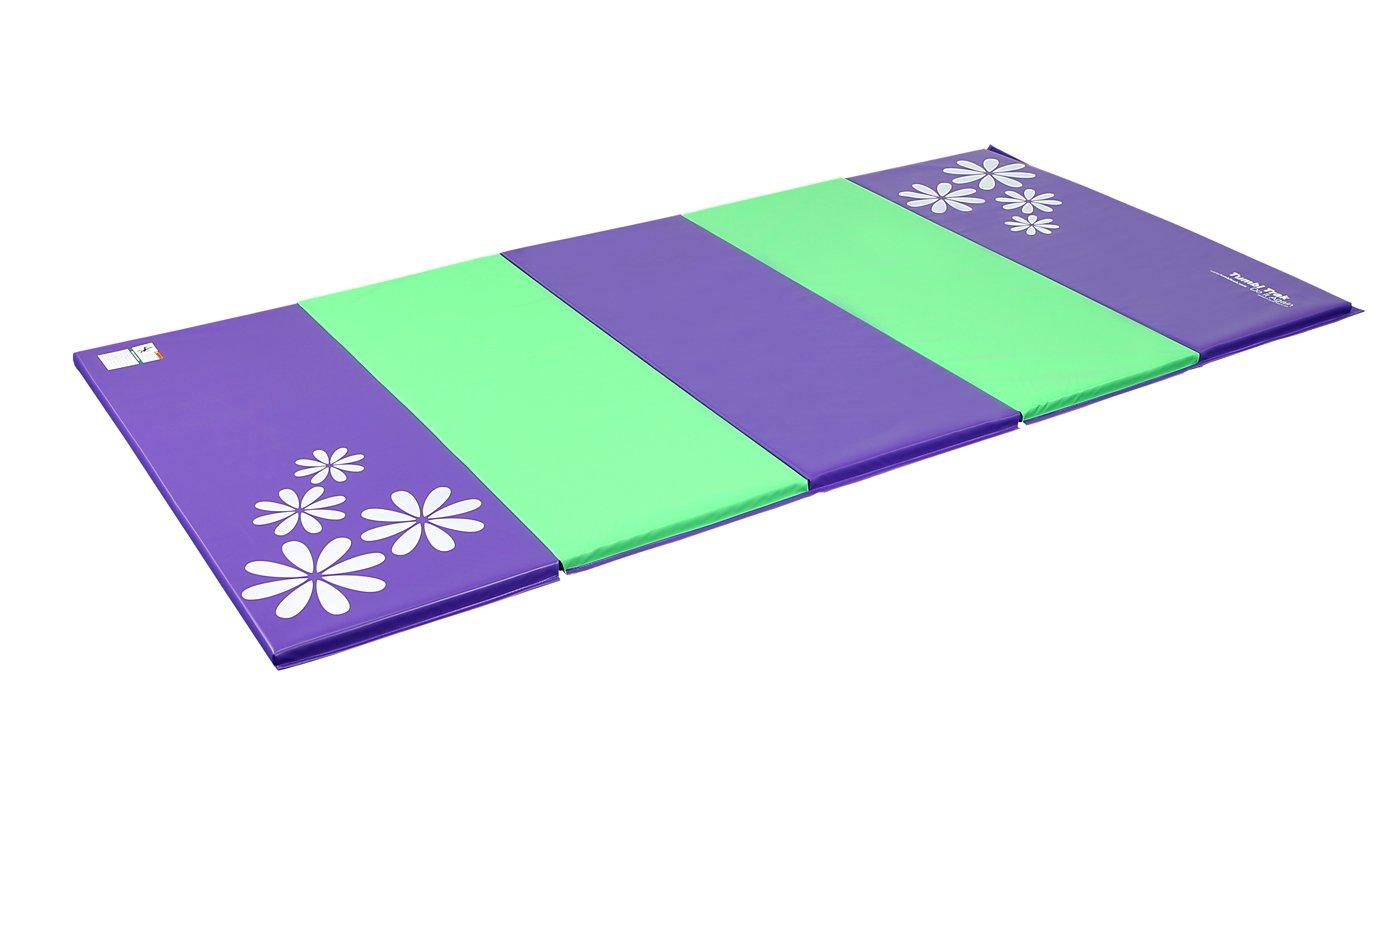 tumbl trak folding gymnastics mat 15m x 3m amazoncouk sports u0026 outdoors